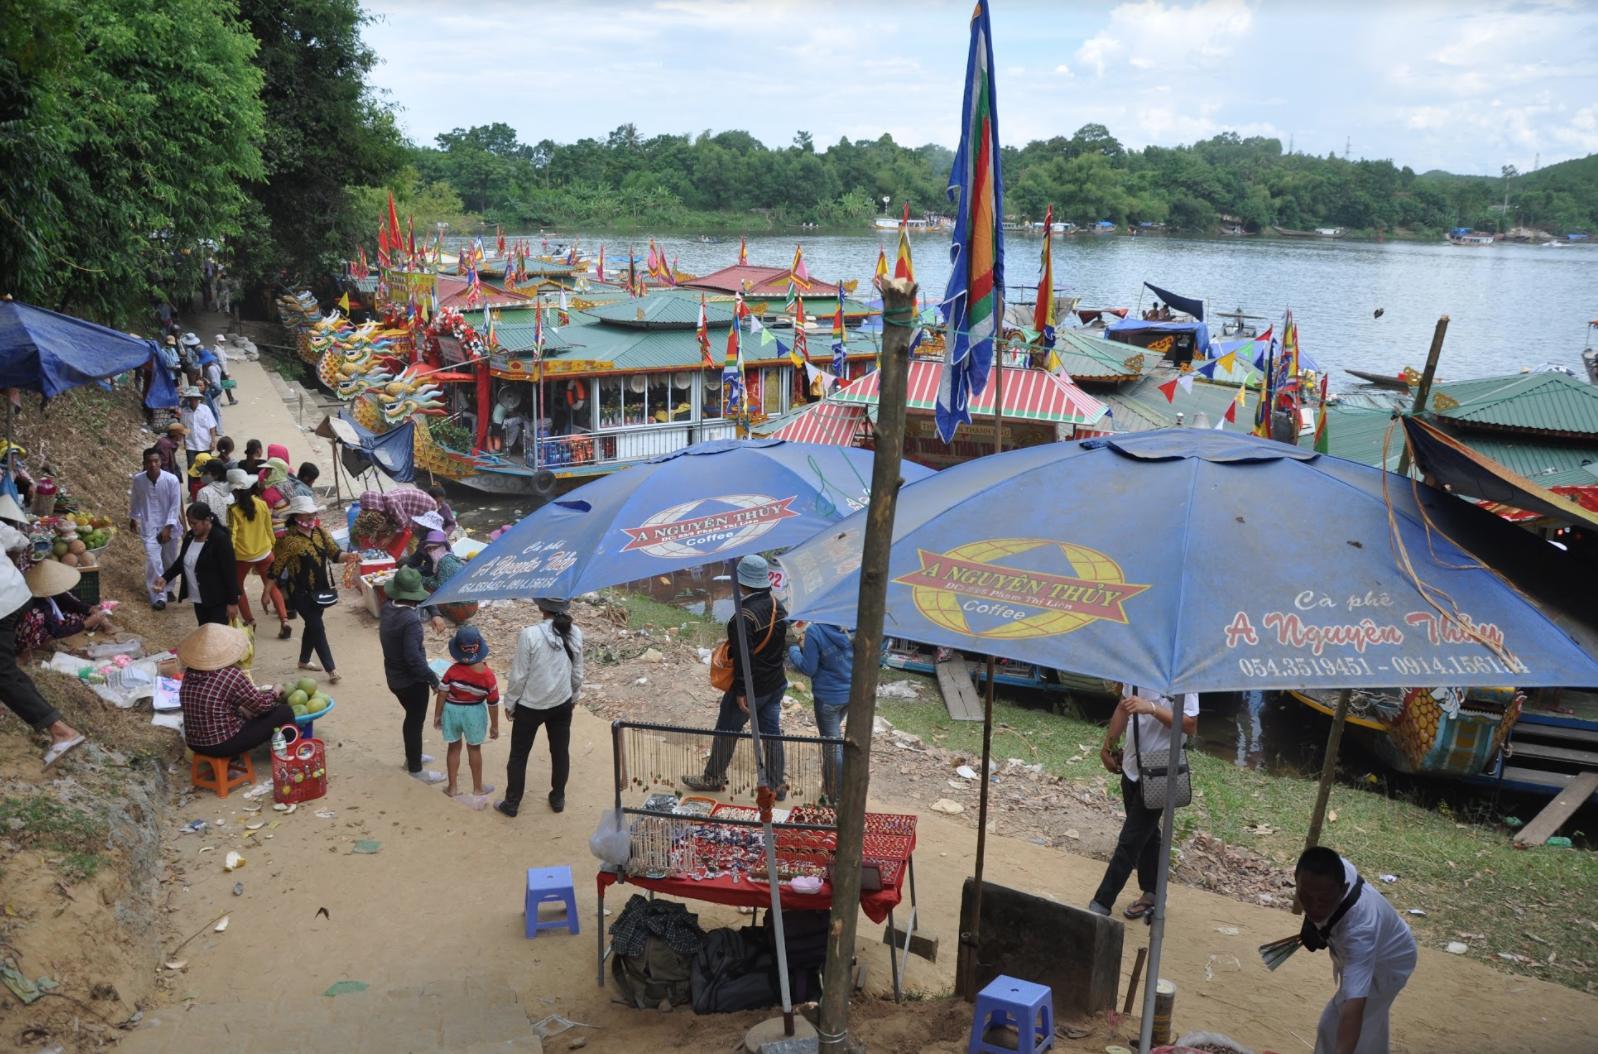 The festival scene at Điện Hòn Chén in Huế. (Photo: Loa/Jenny Lý)